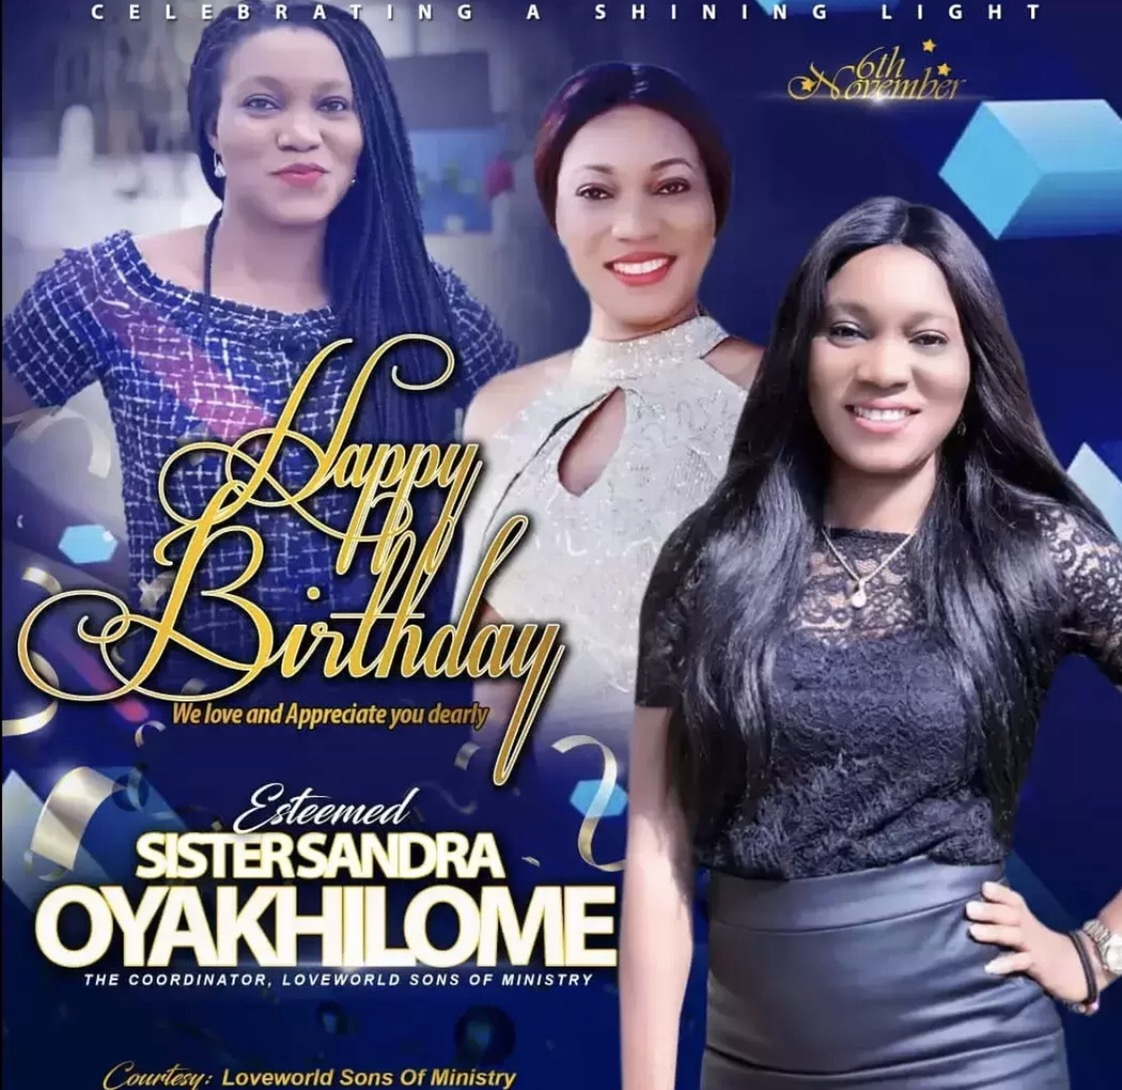 Happy birthday sis Sandra Oyakhilome